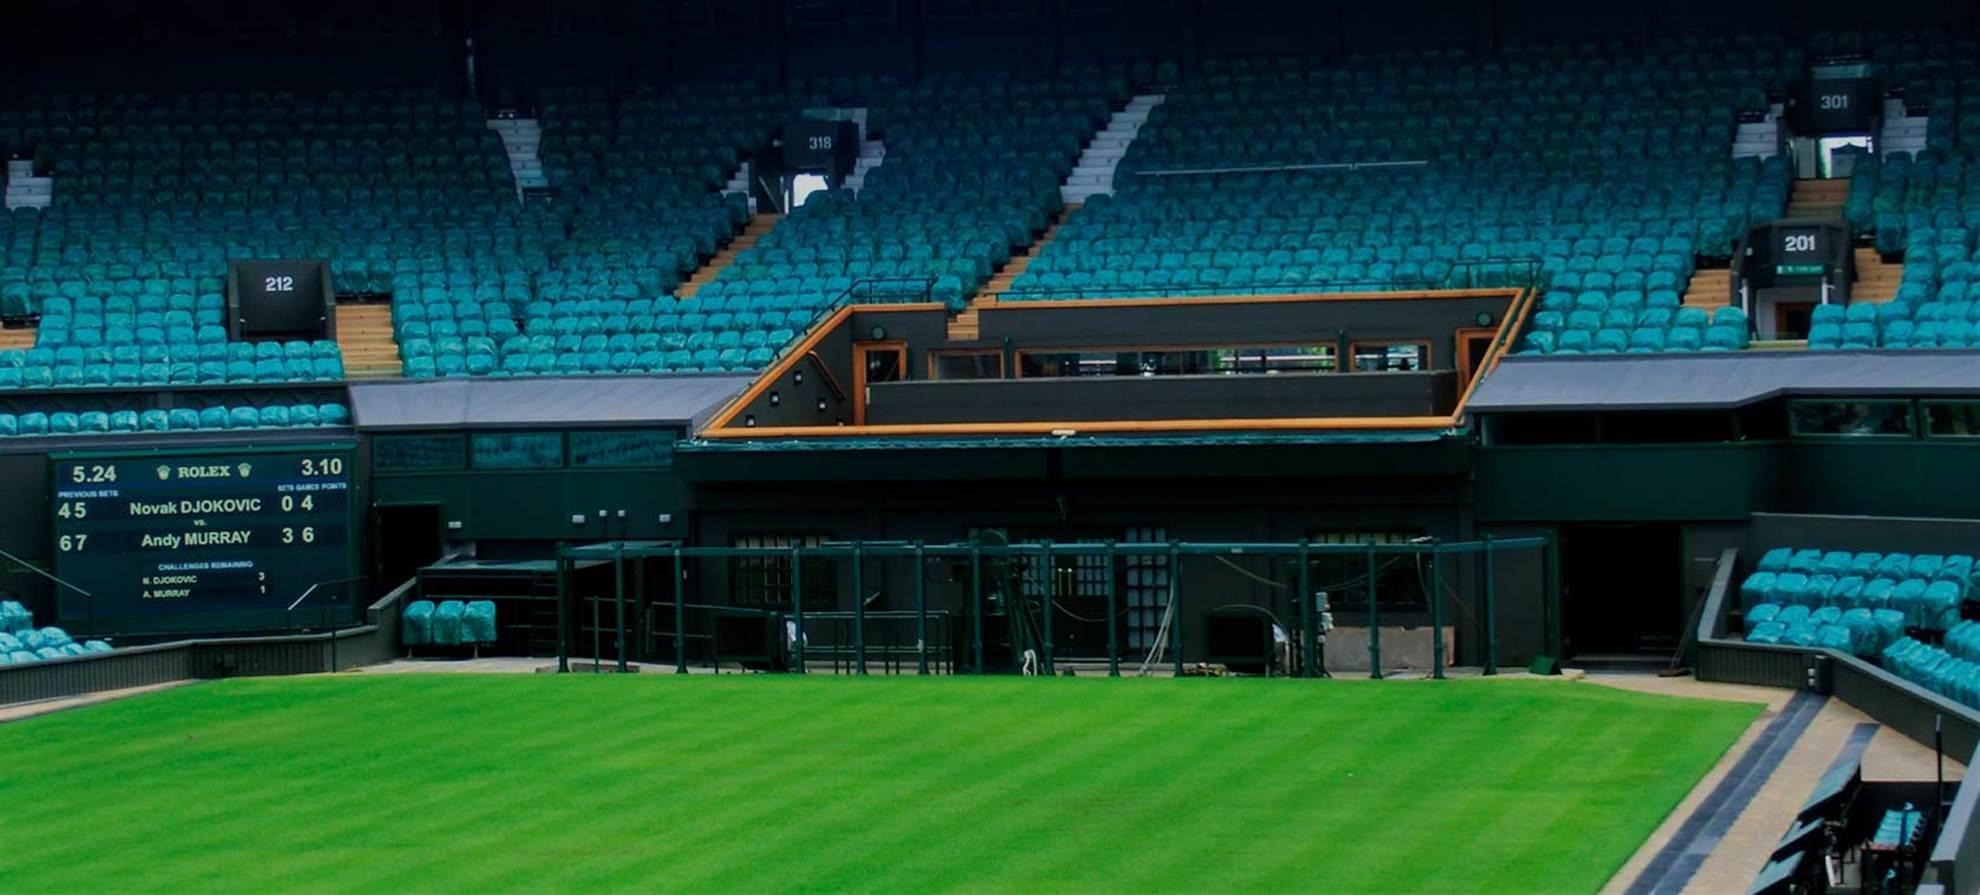 Wimbledon Lawn Guided Tour